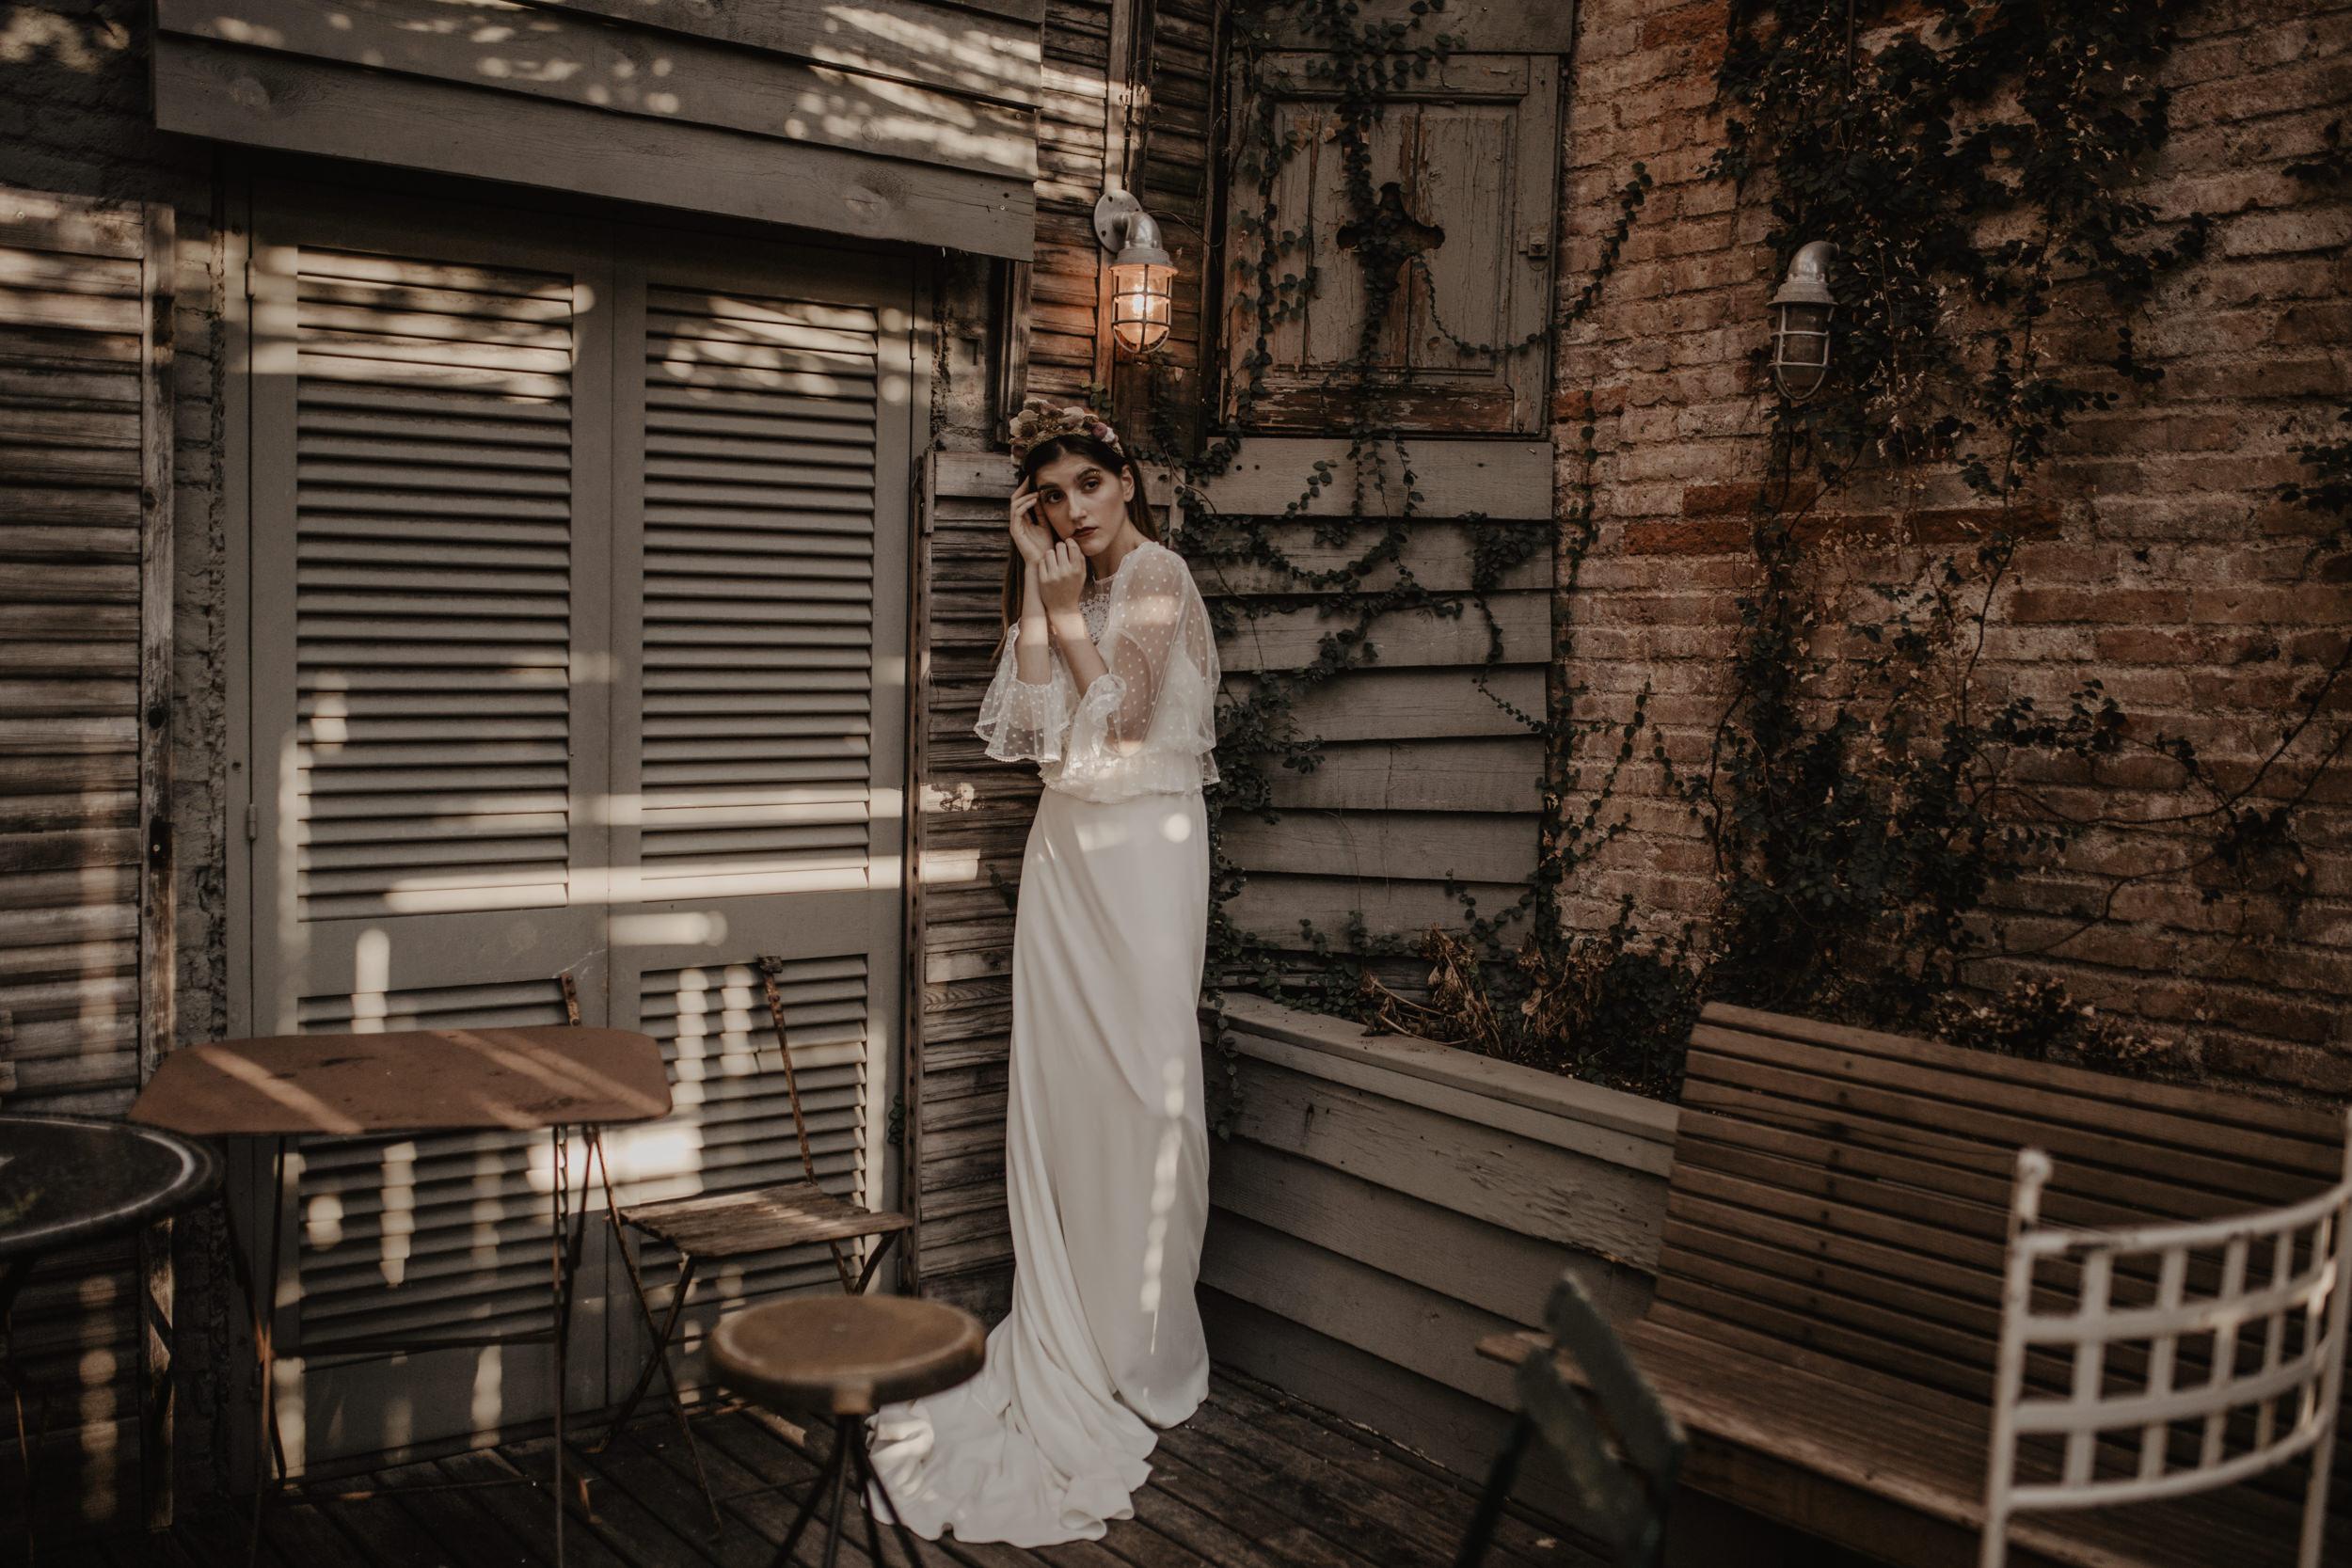 thenortherngirlphotography_photography_thenortherngirl_rebeccascabros_wedding_weddingphotography_weddingphotographer_barcelona_fashionbarcelona_unconventionalwedding_lacasademuñecas-202.jpg